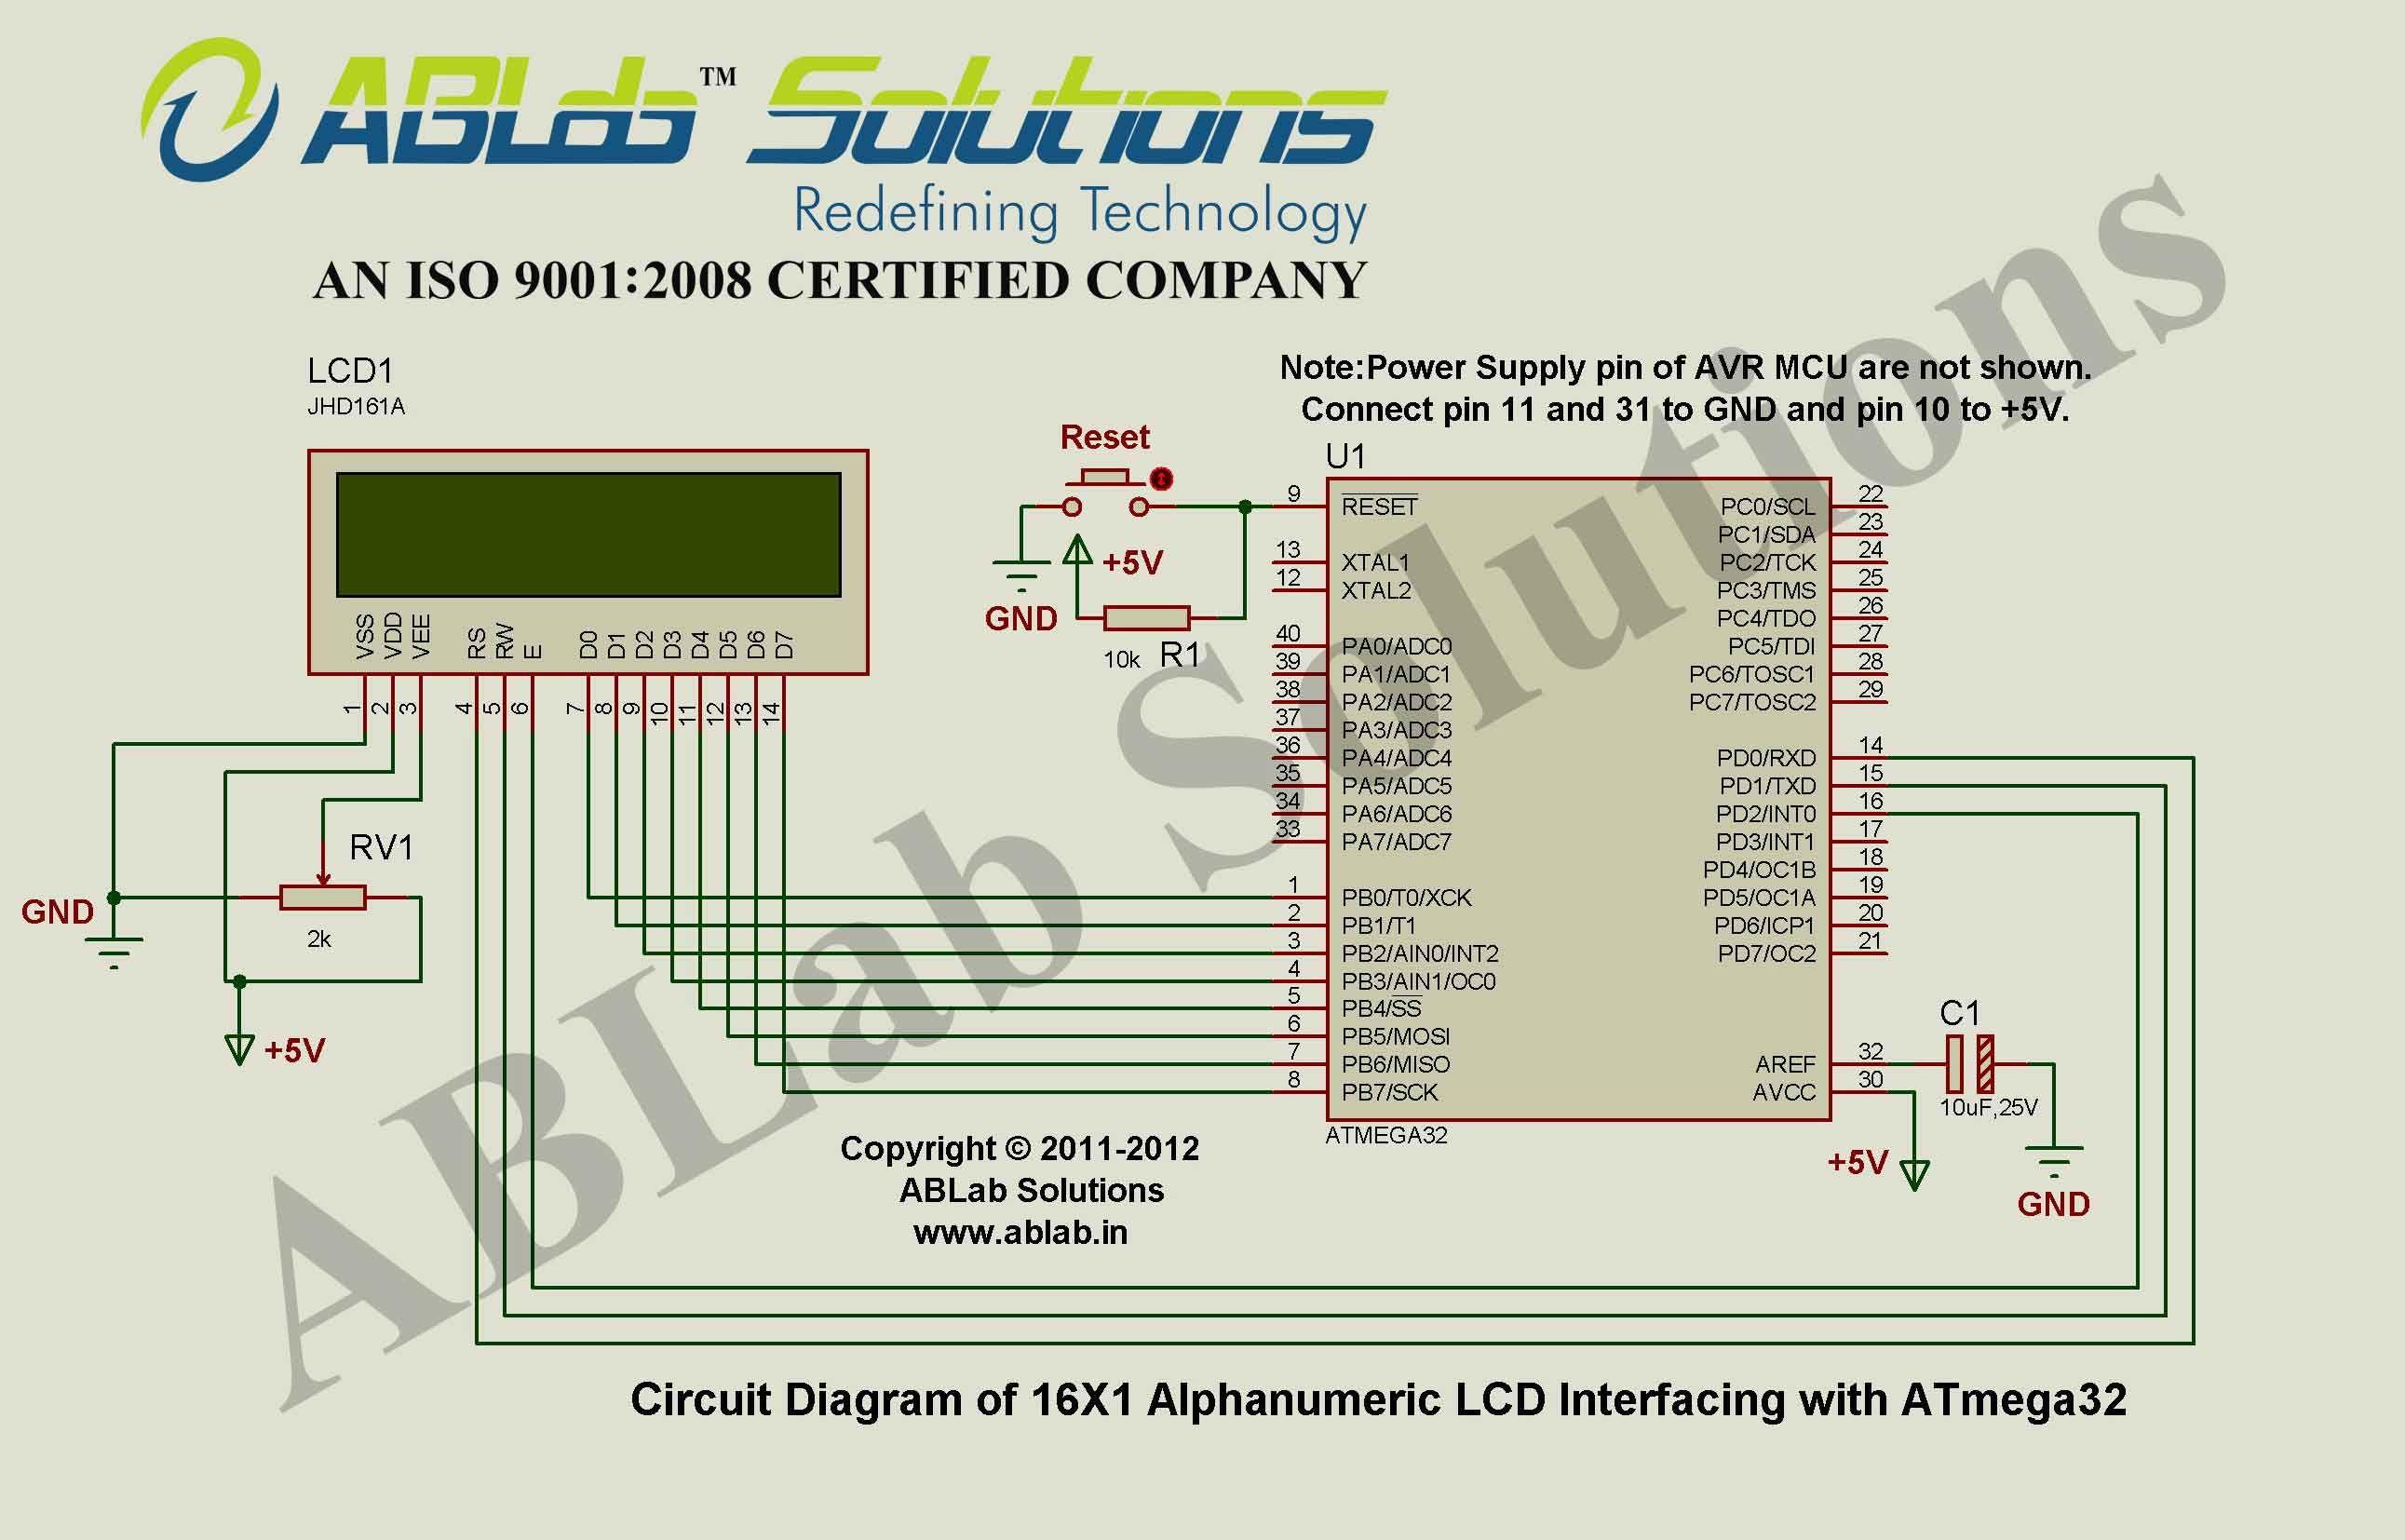 16x1 Alphanumeric Lcd Interfacing With Avr Atmega32 Microcontroller Circuit Diagram Ablab Solutions